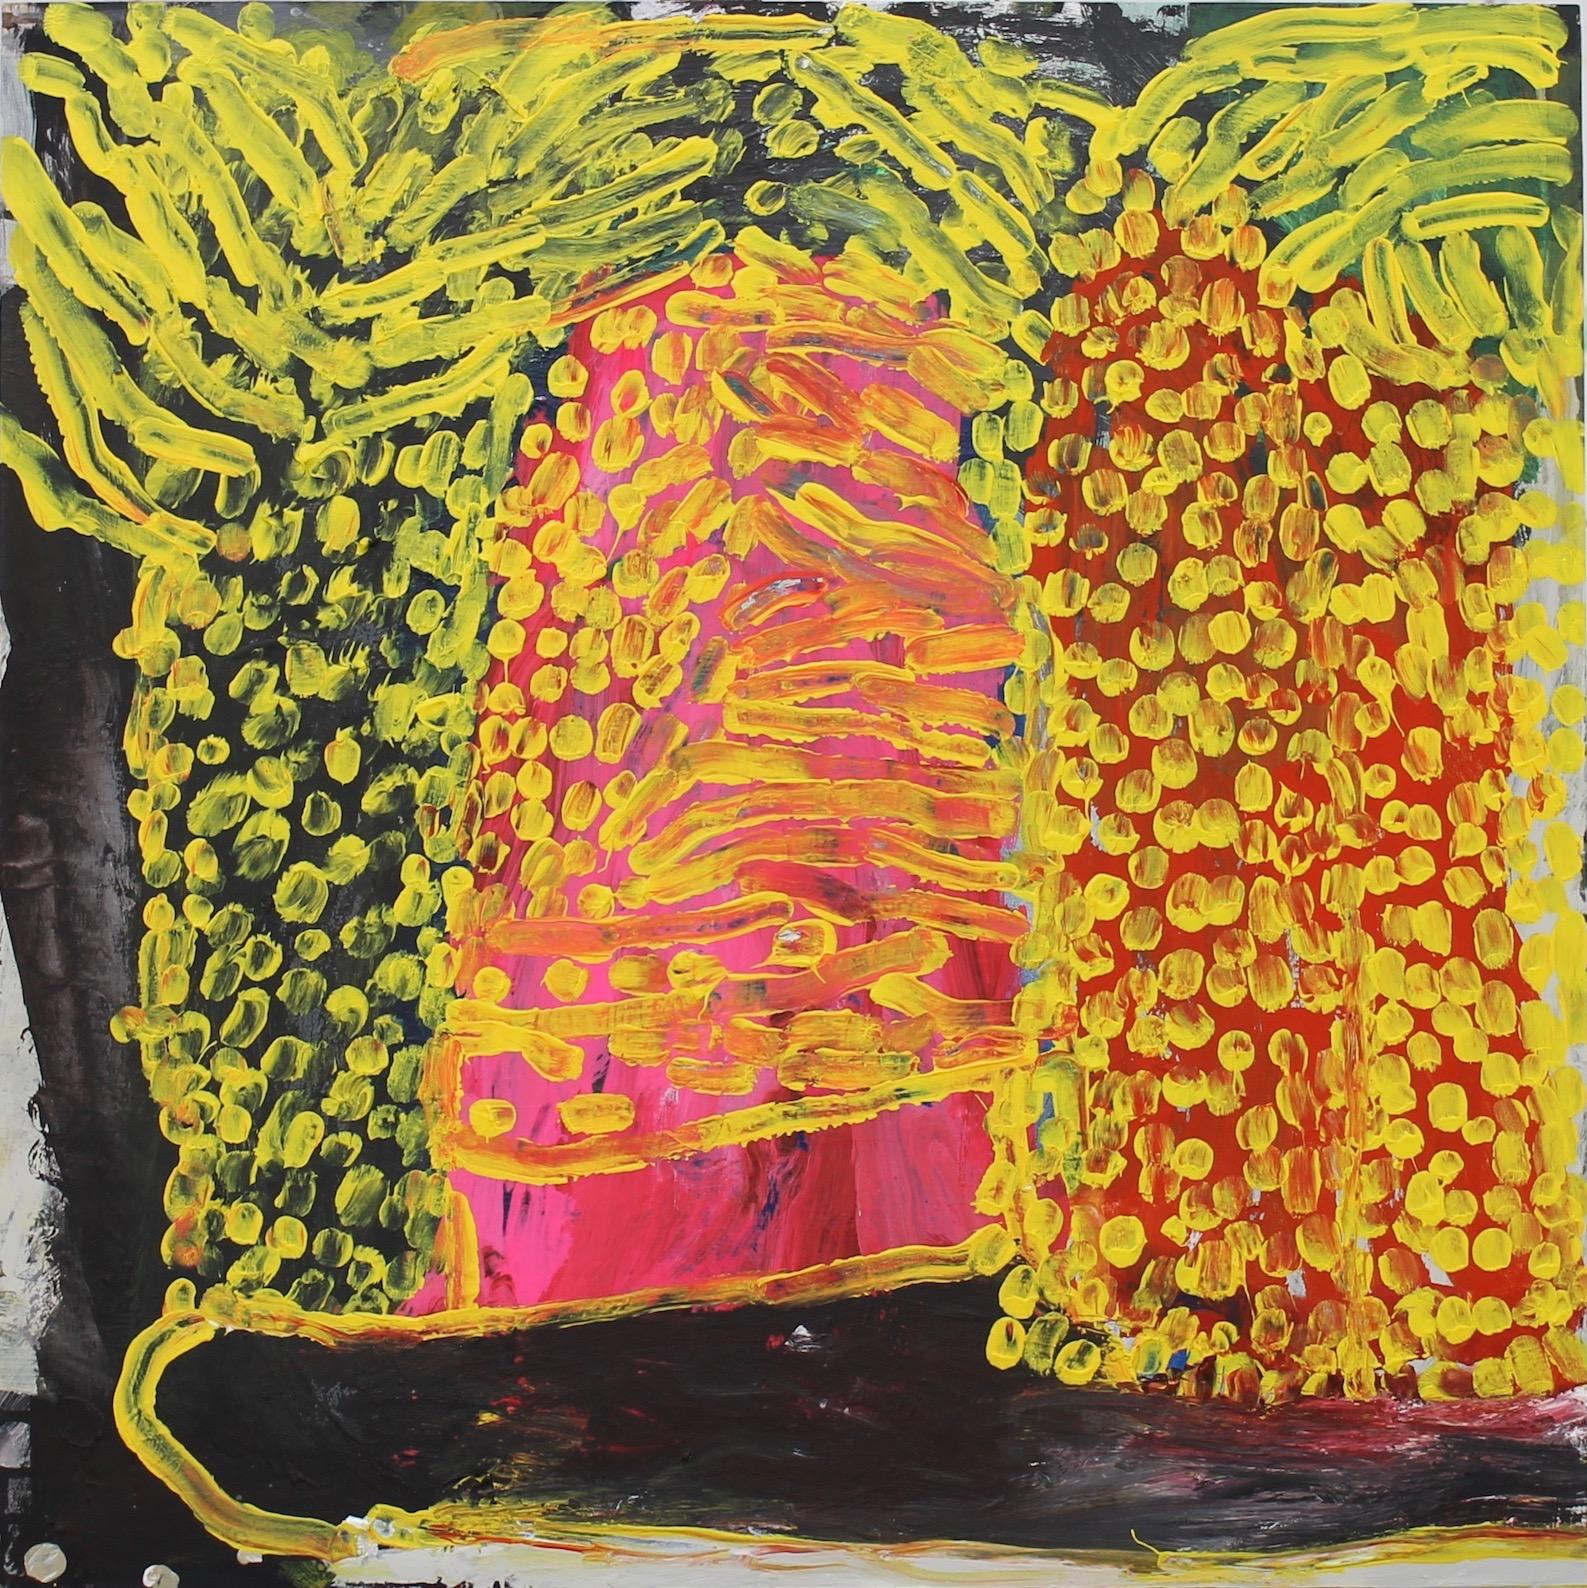 2. Neon palm 2 60x60cm vinyl birch panel by Catherine Cassidy